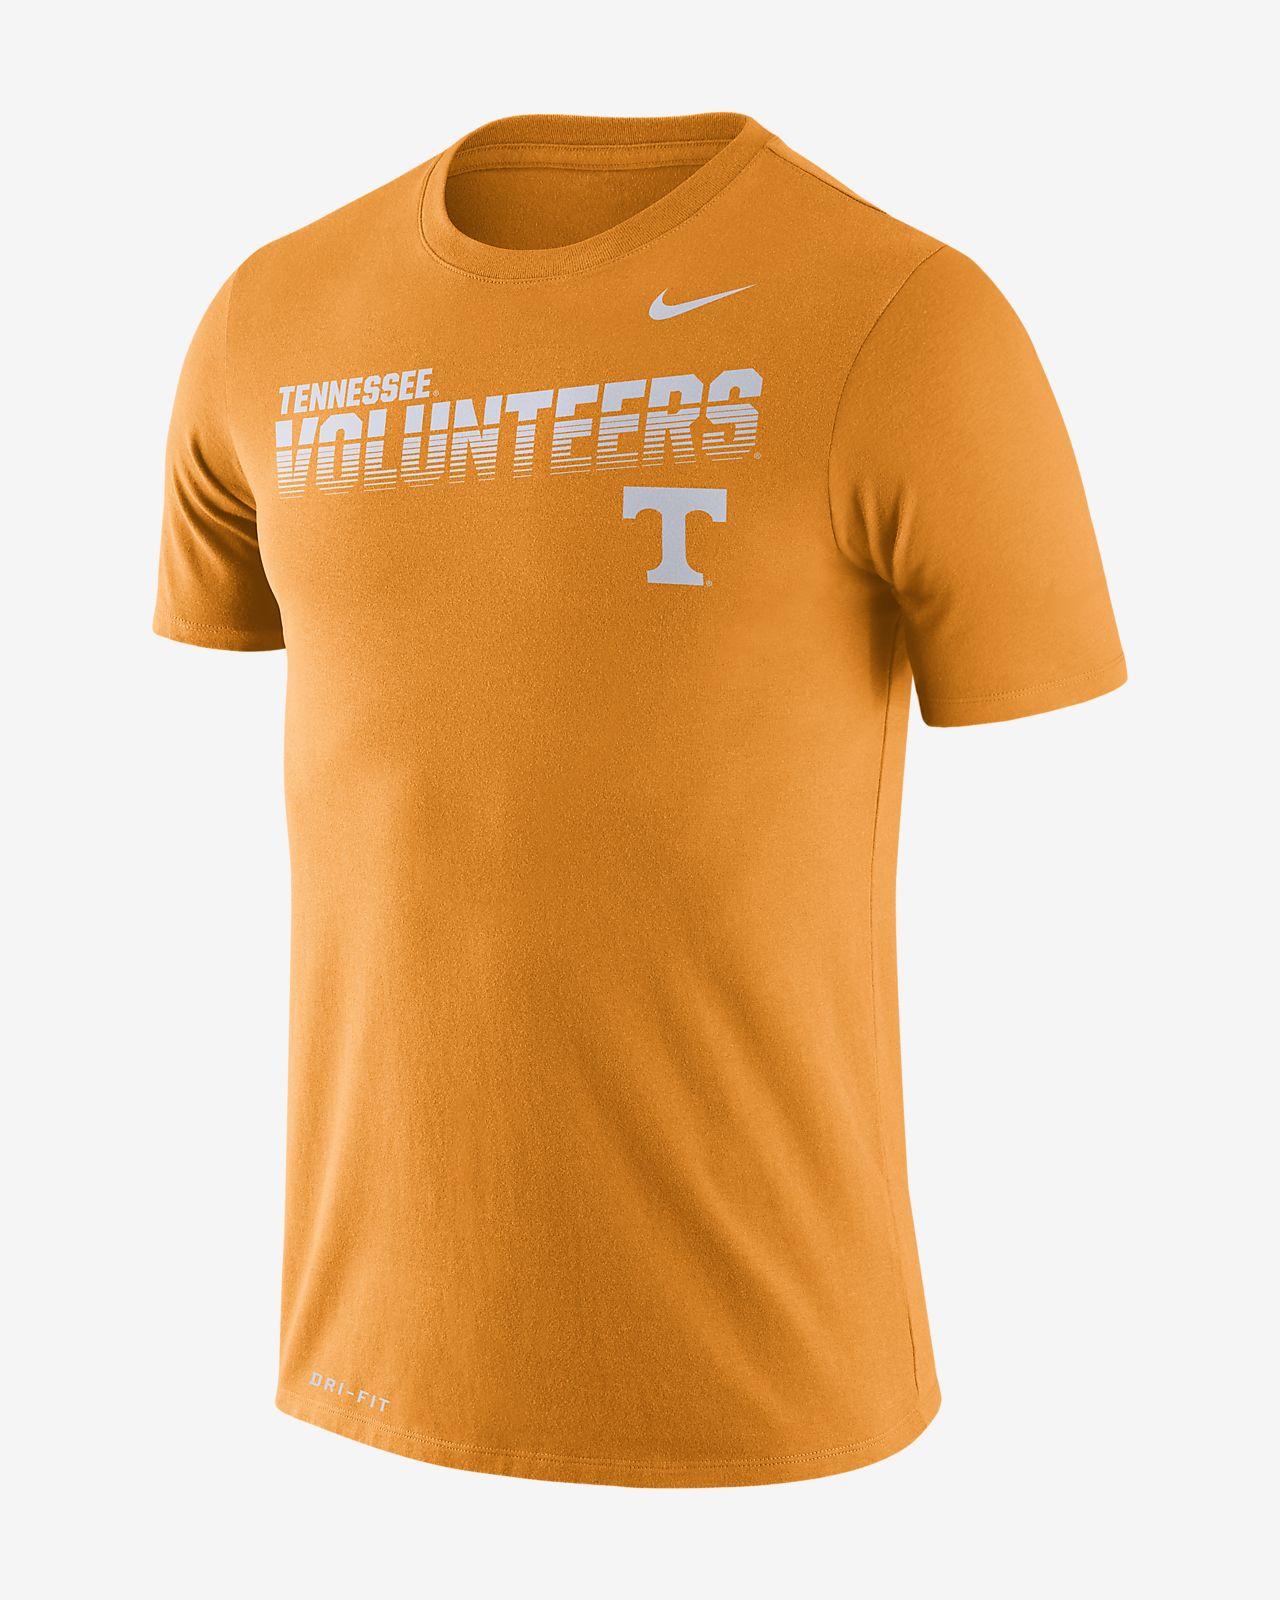 Nike College Dri-FIT Legend (Tennessee) Men's T-Shirt